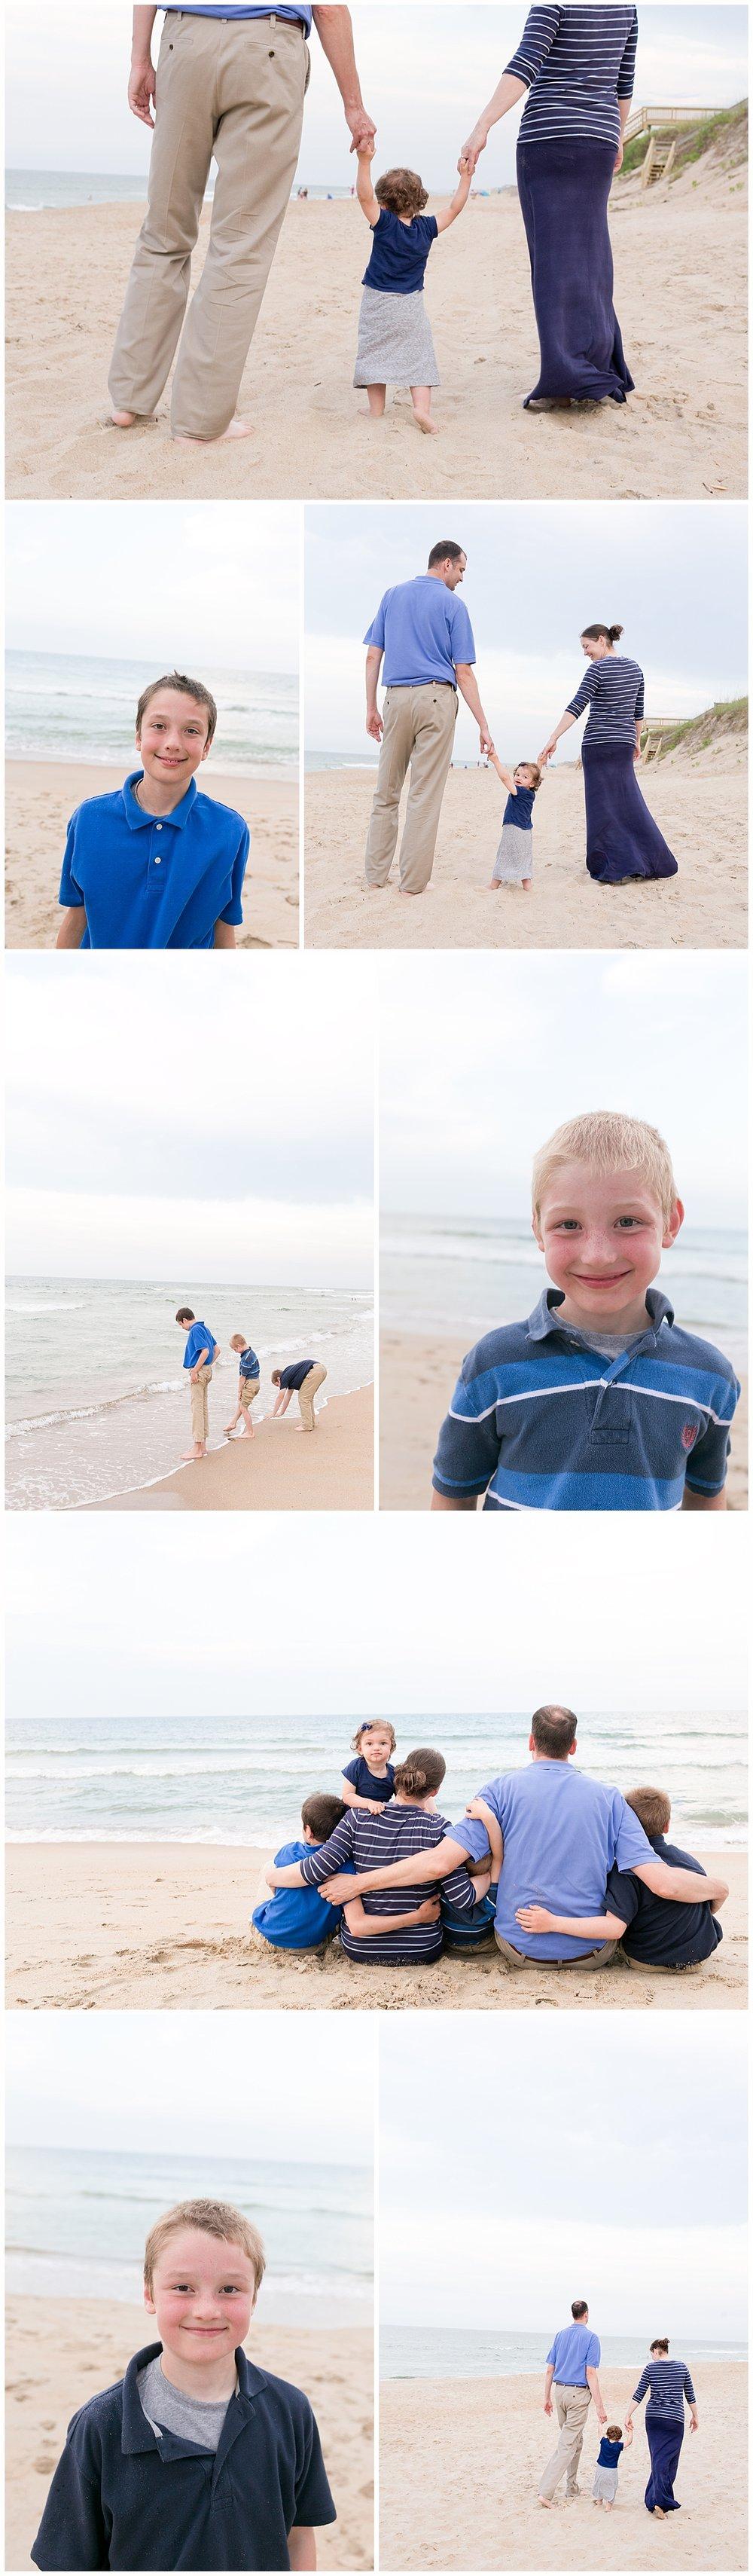 family photos at the beach - Ocean Springs family photographer